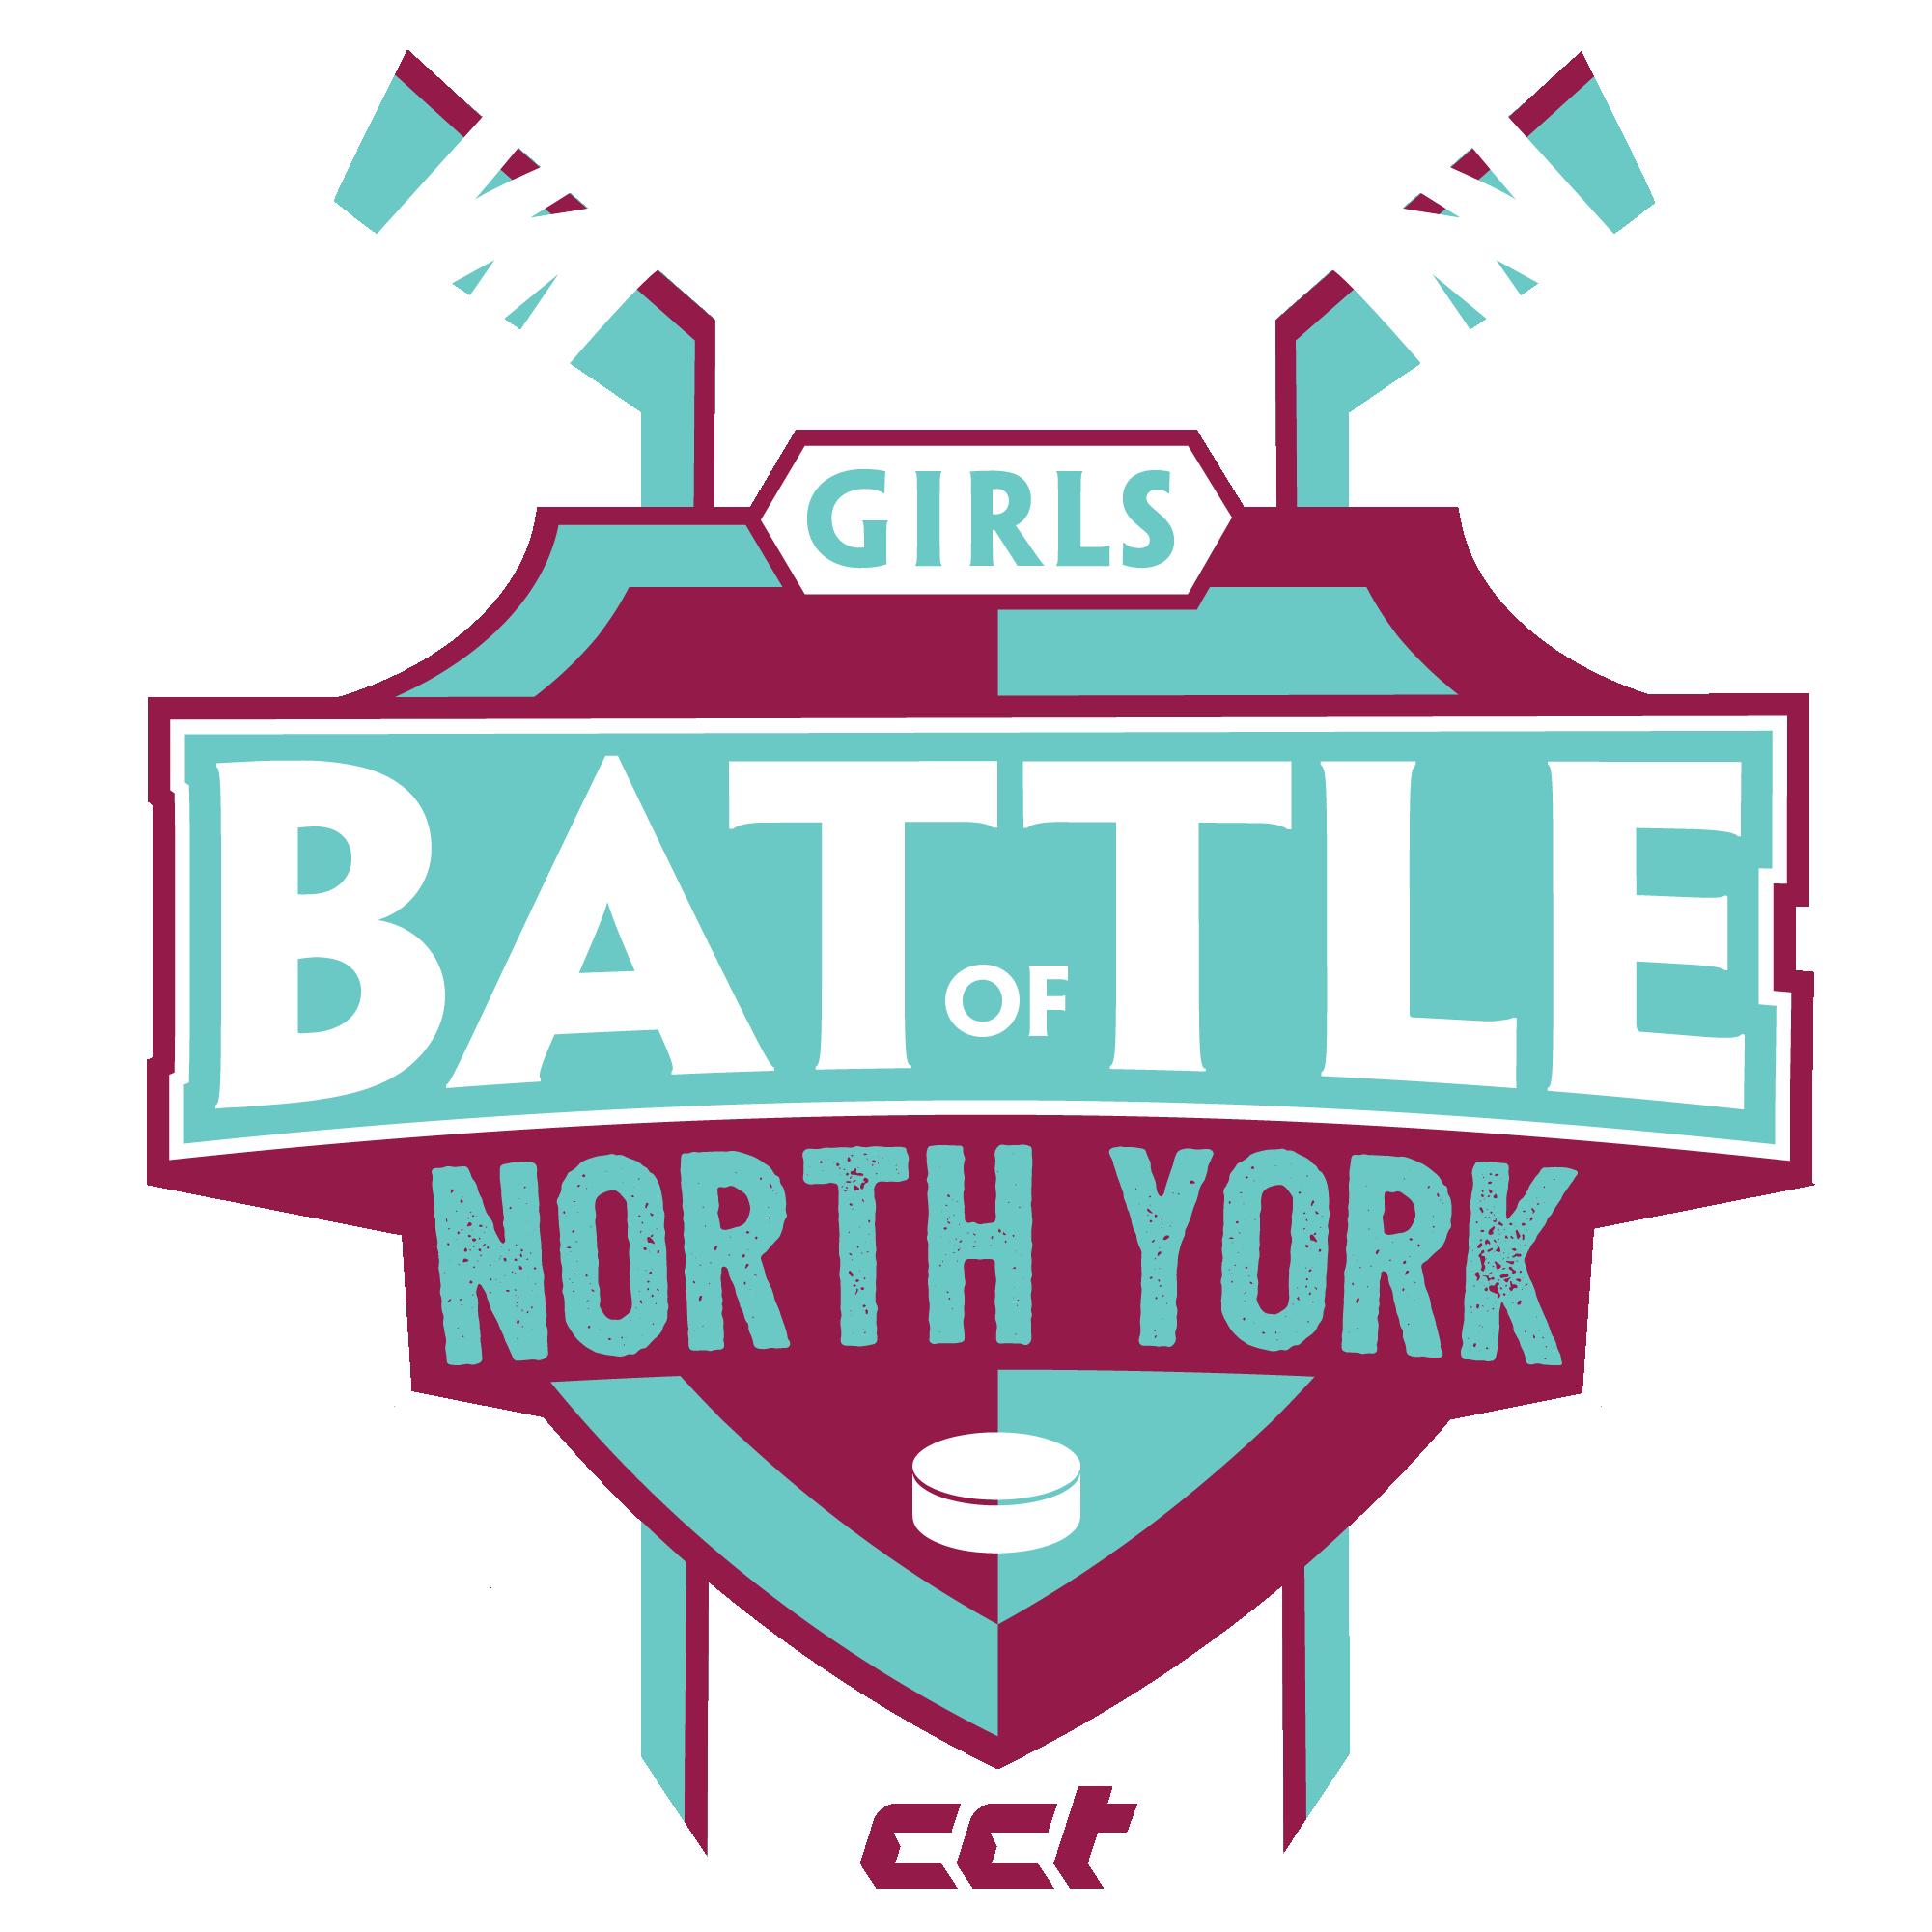 Hockey clipart hockey tournament. Girls battle of north